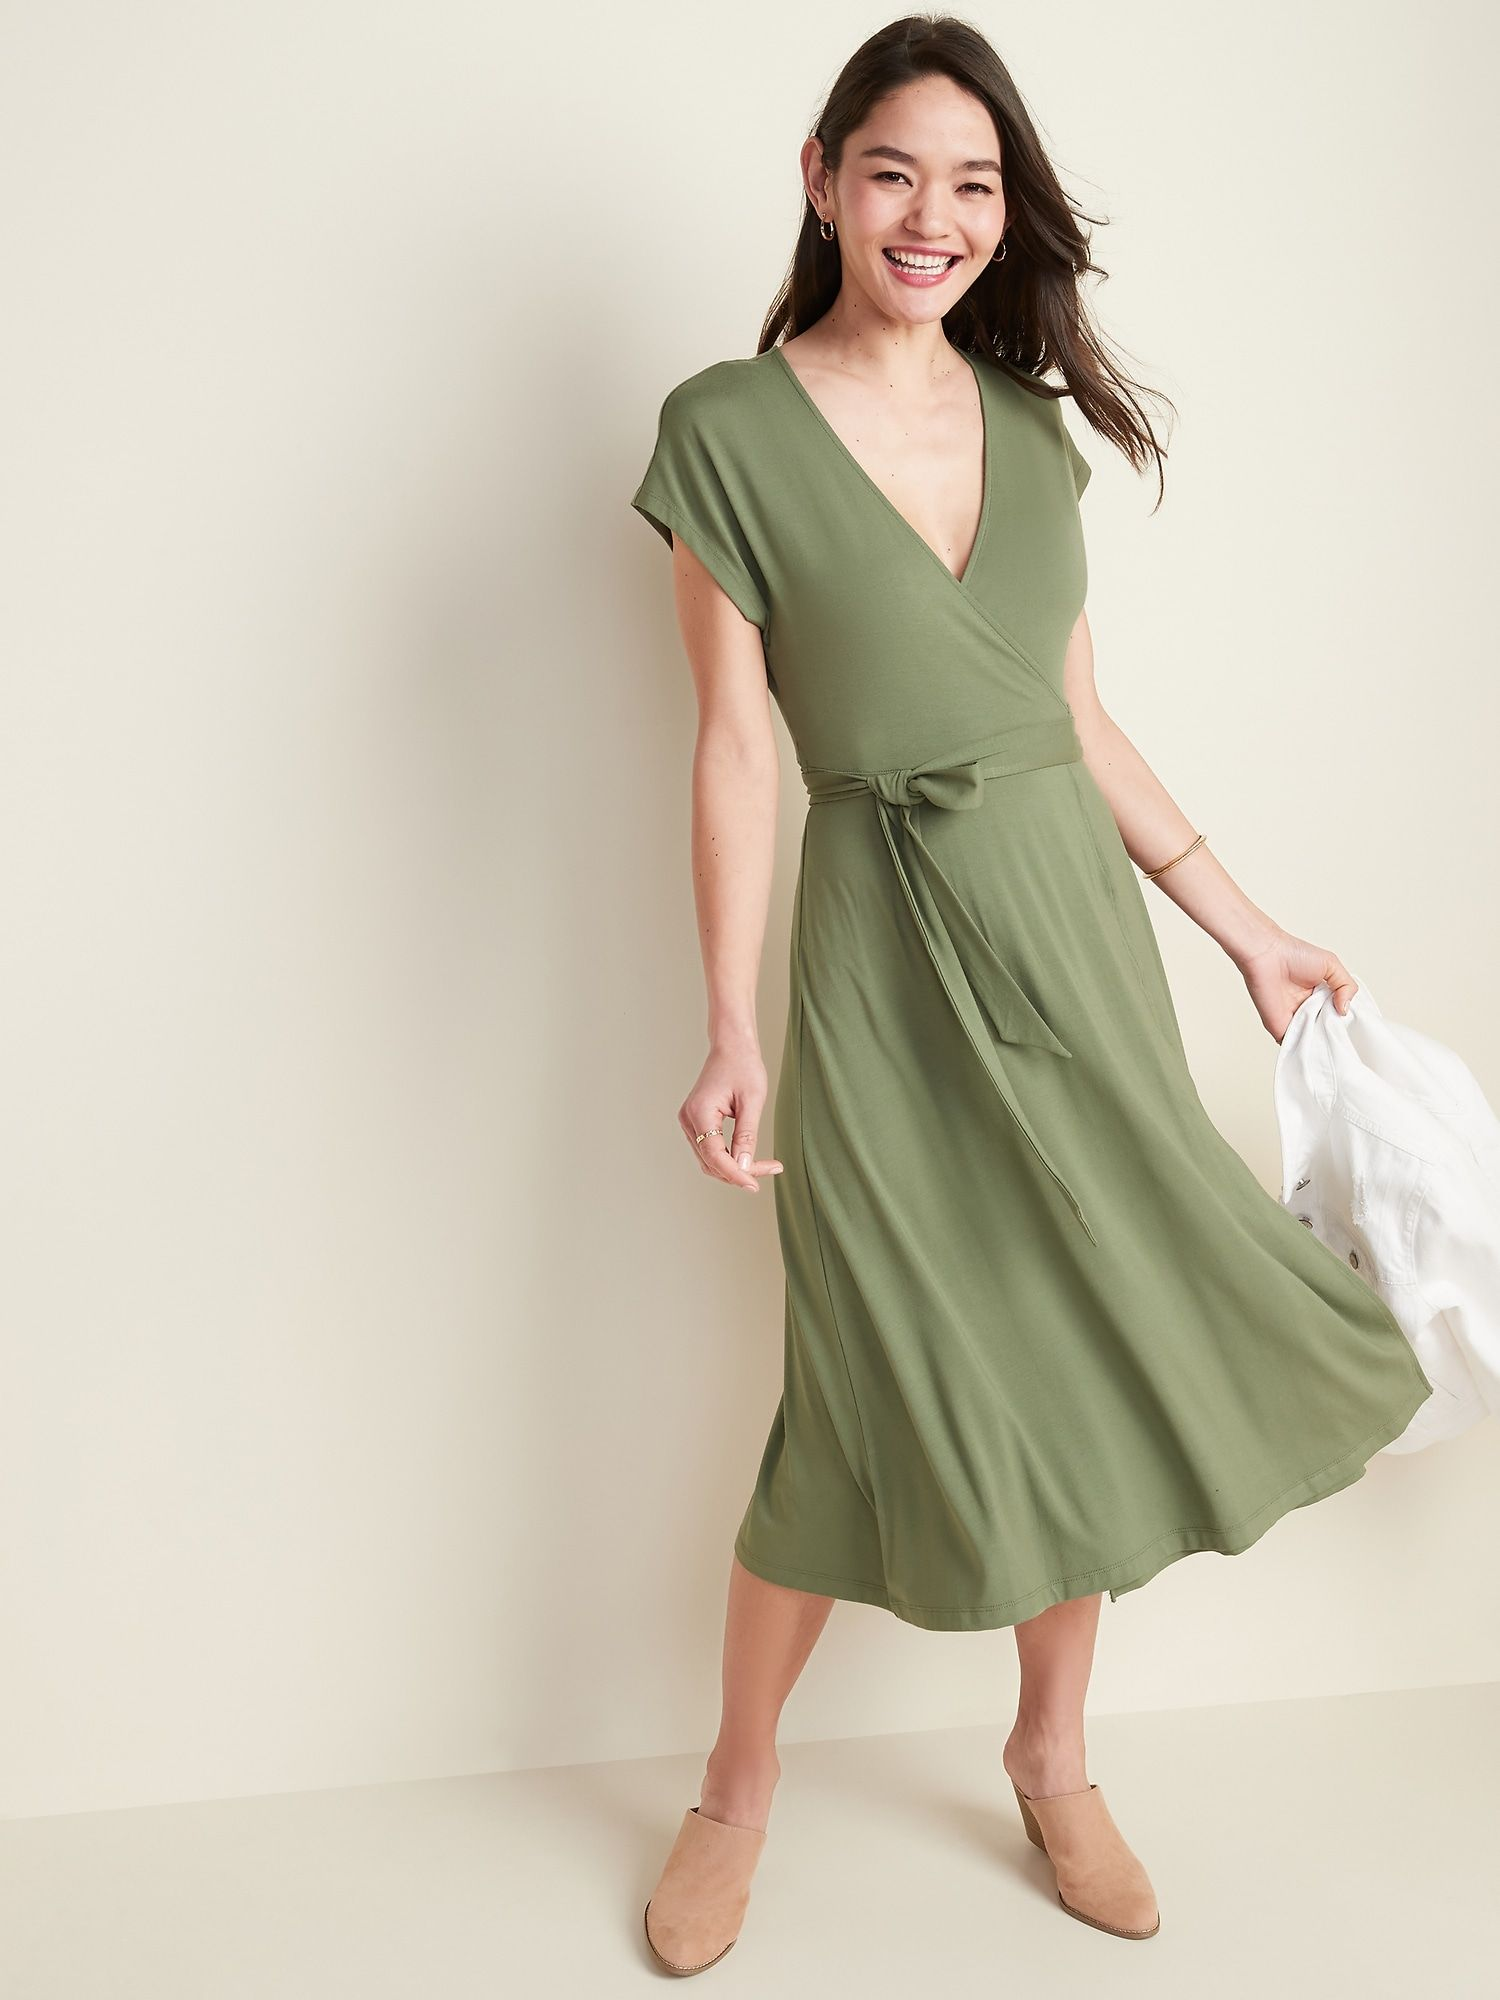 Wrap Front Dolman Sleeve Midi Dress For Women Old Navy Midi Dress With Sleeves Dresses Womens Dresses [ 2000 x 1500 Pixel ]